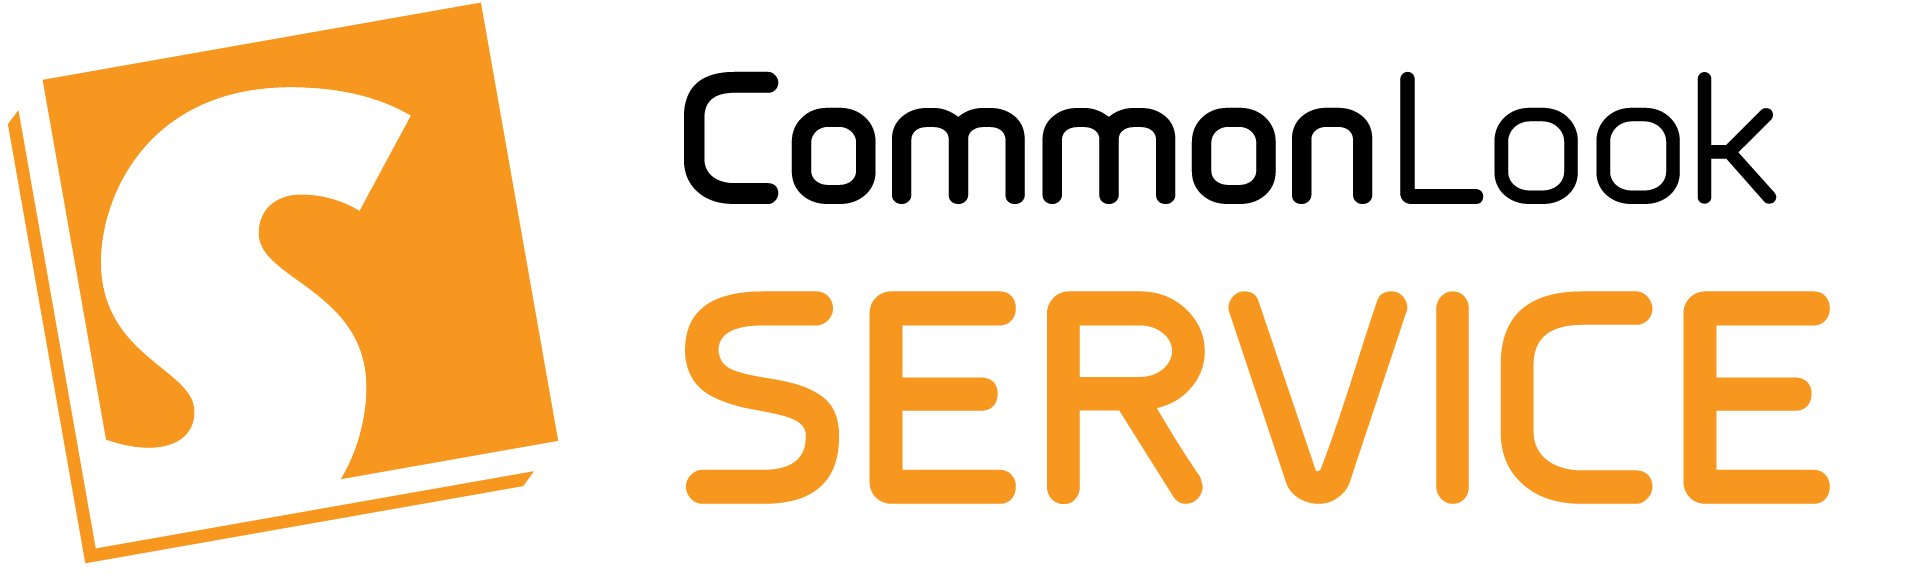 CommonLook Service